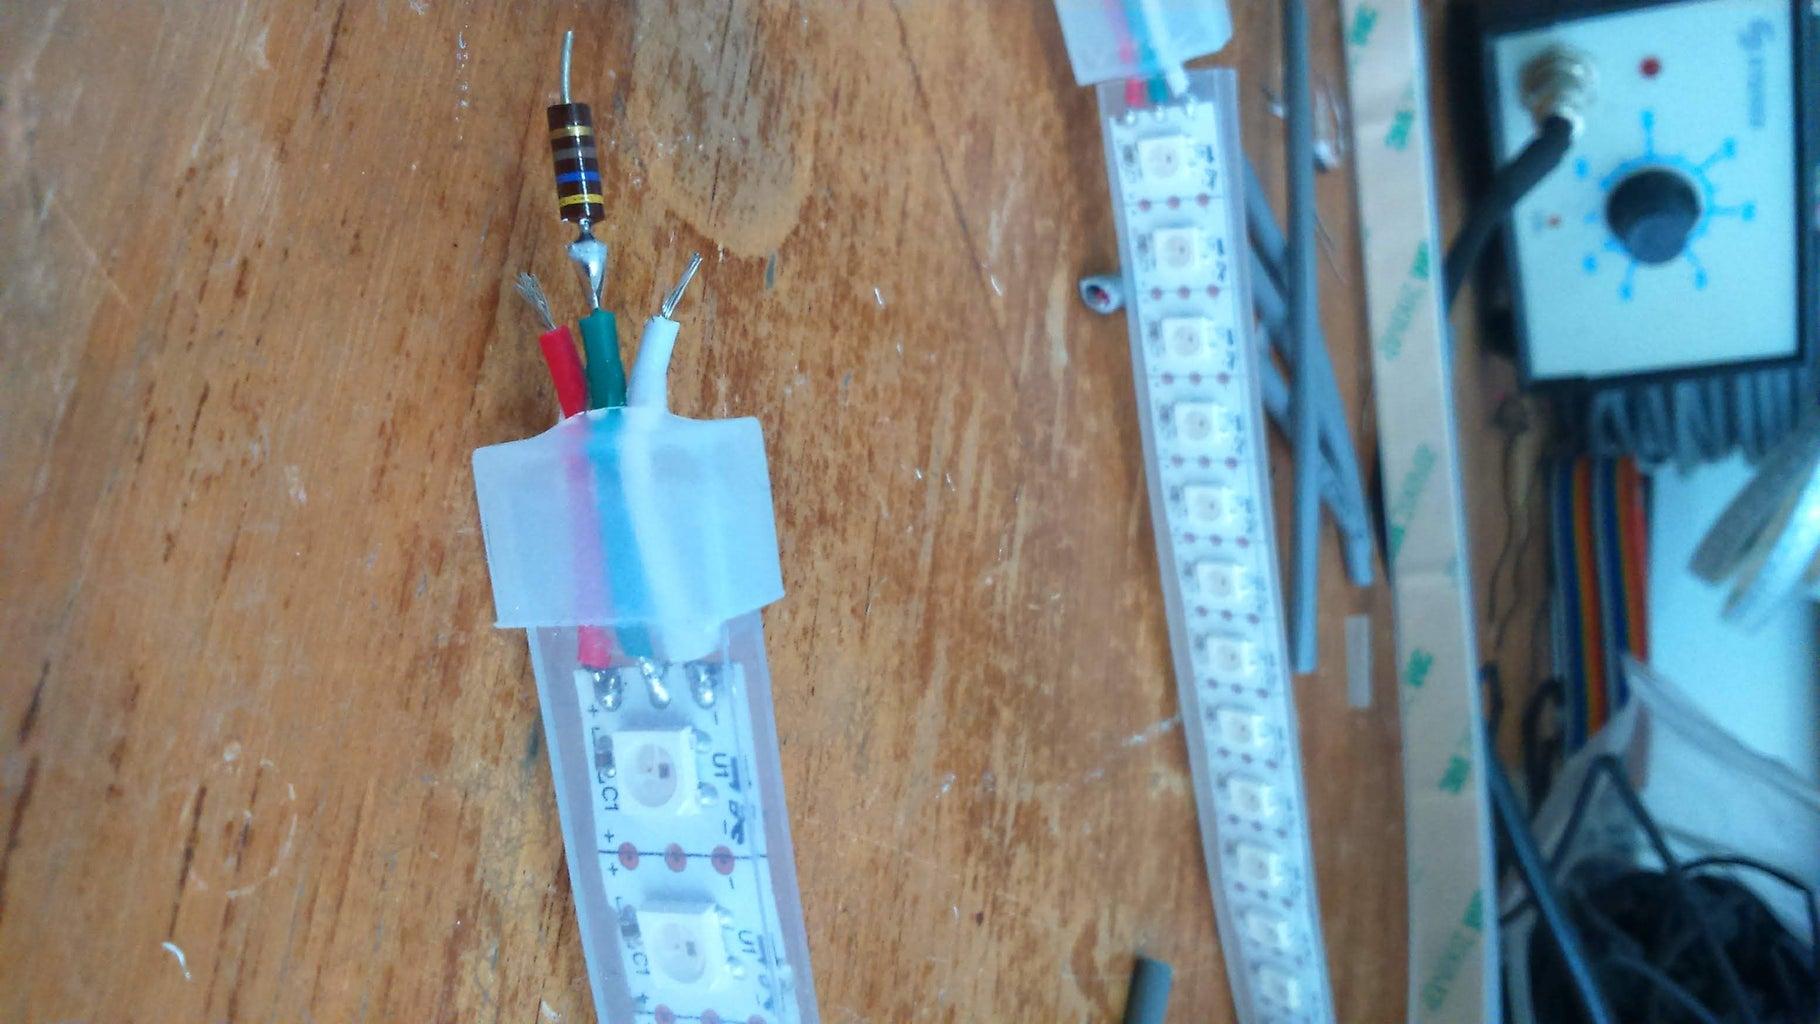 Installing Neopixel Strips